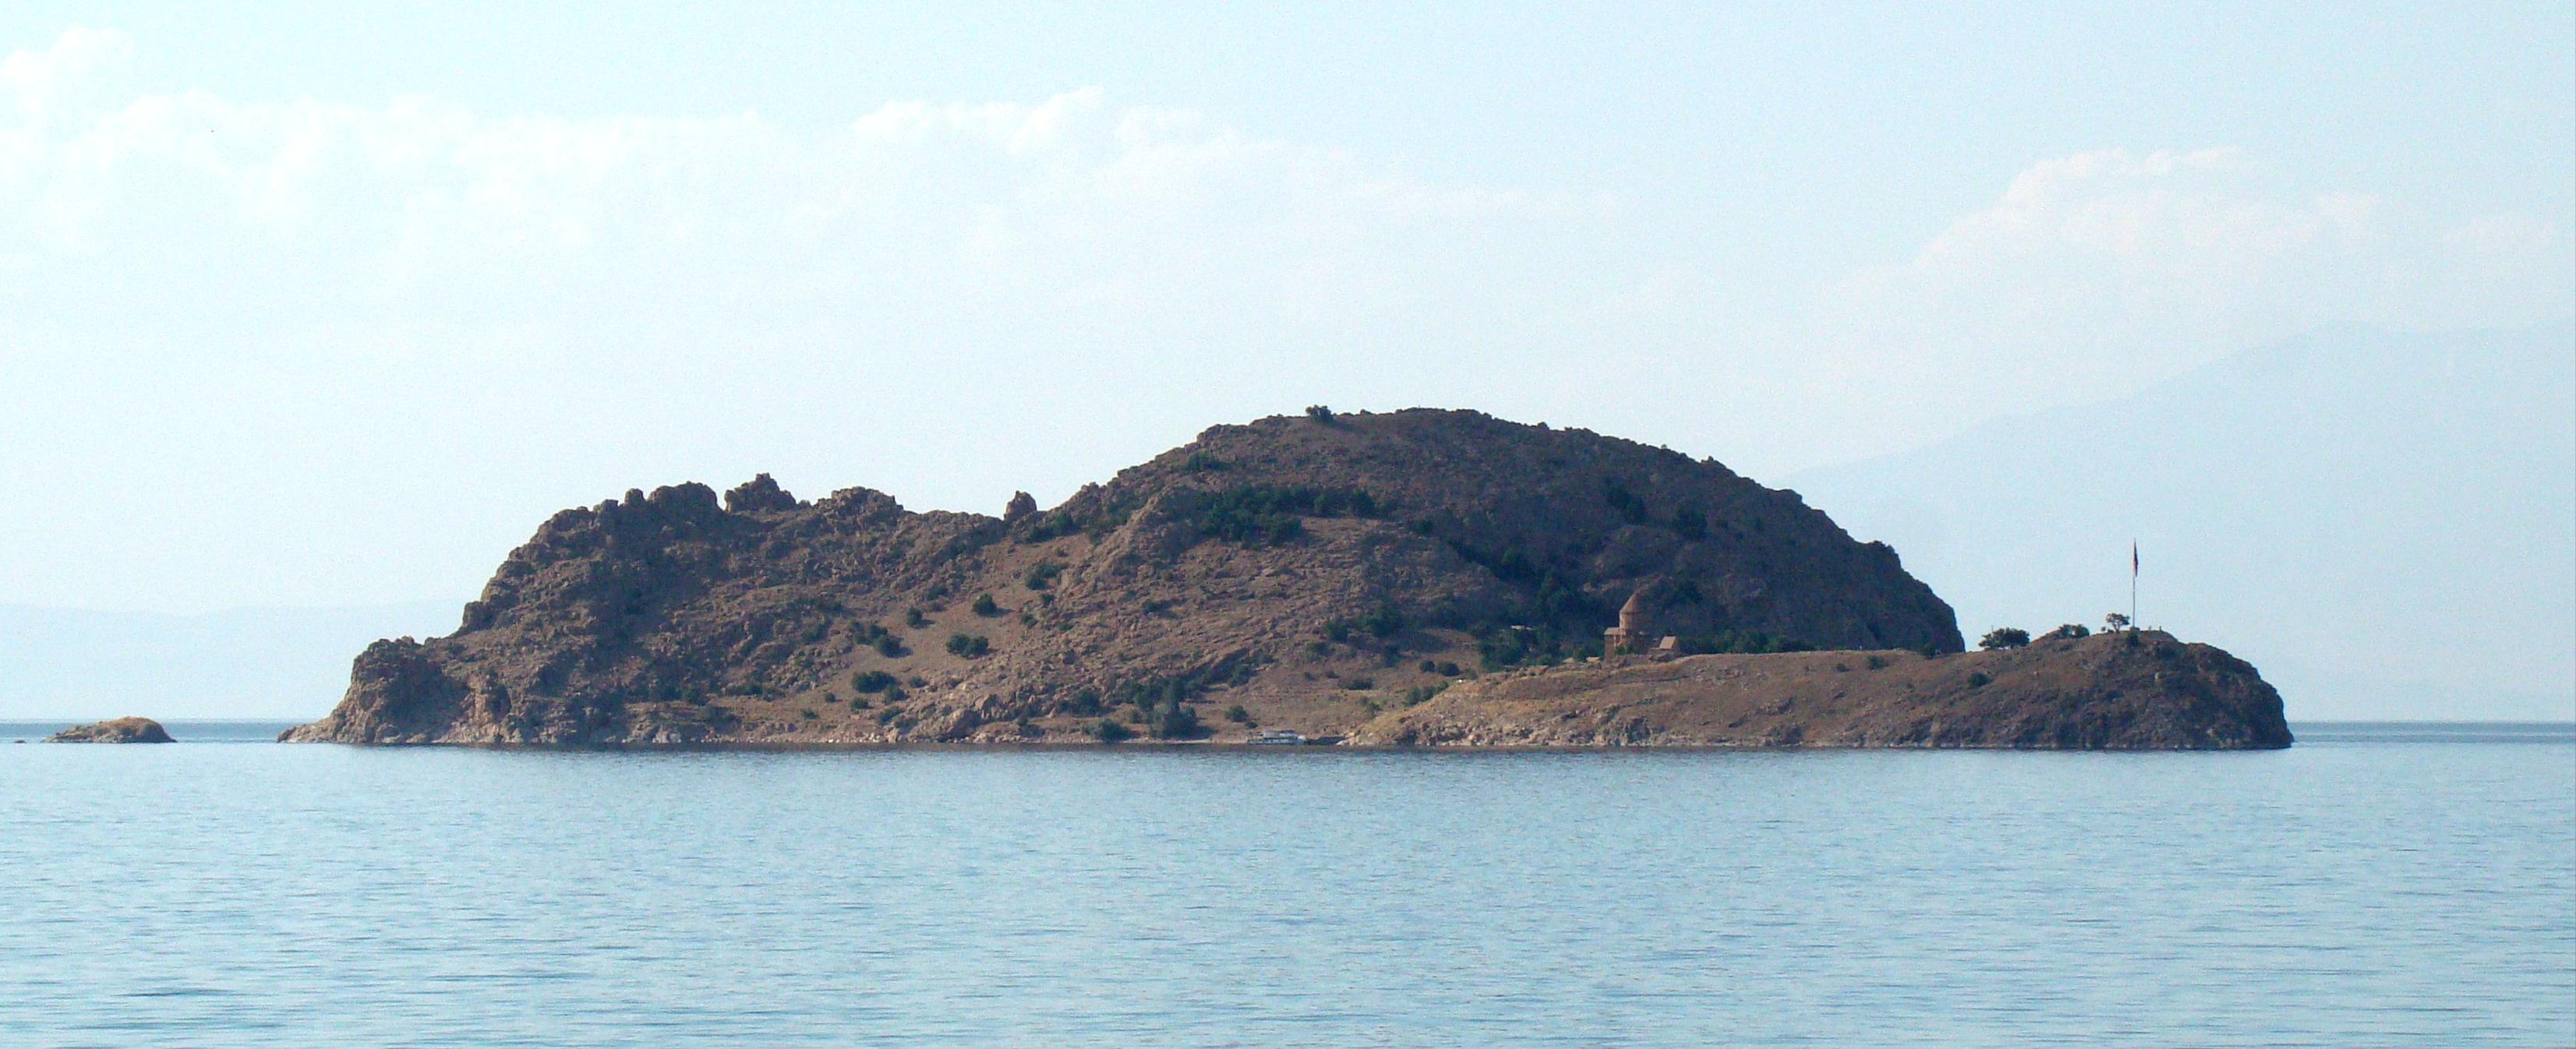 31ce8fbae3 Akdamar Island - Wikipedia